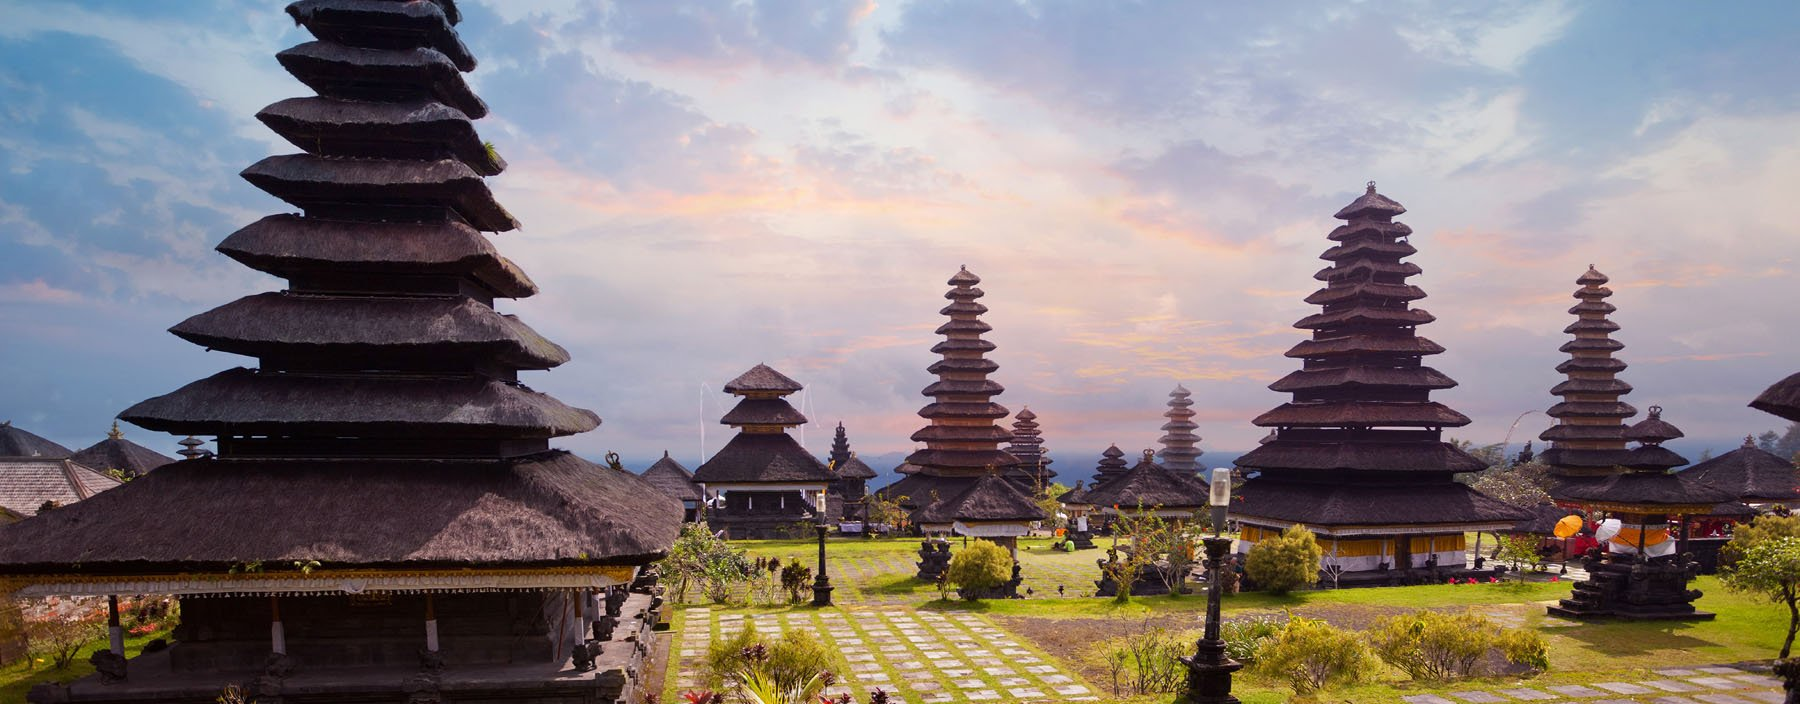 id, bali, sidemen, besakih temple (1).jpg